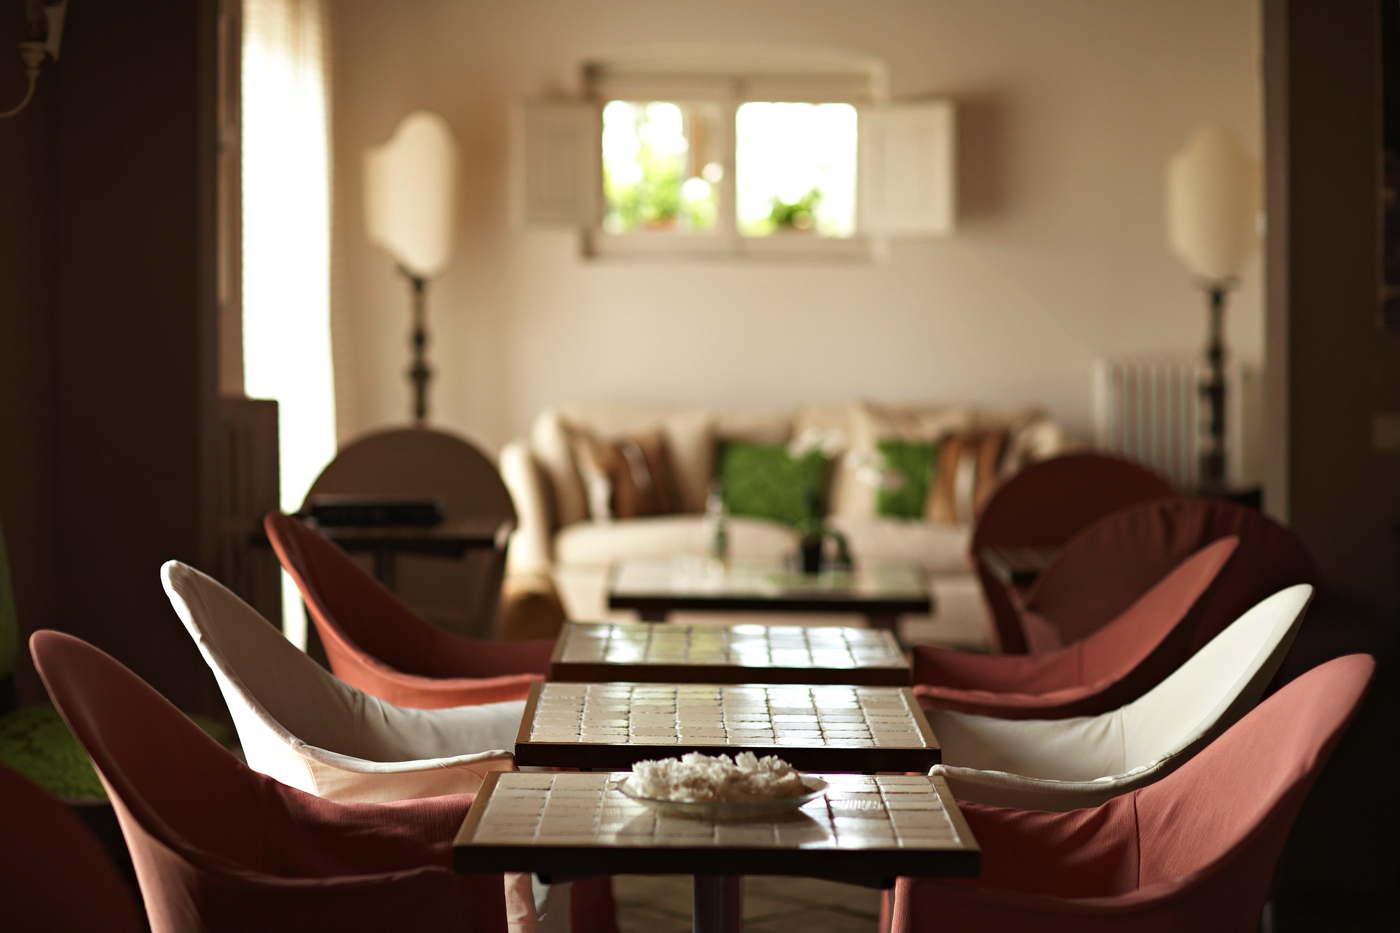 Luxusvilla in italien villa toskana mieten designhotel for Designhotel toskana